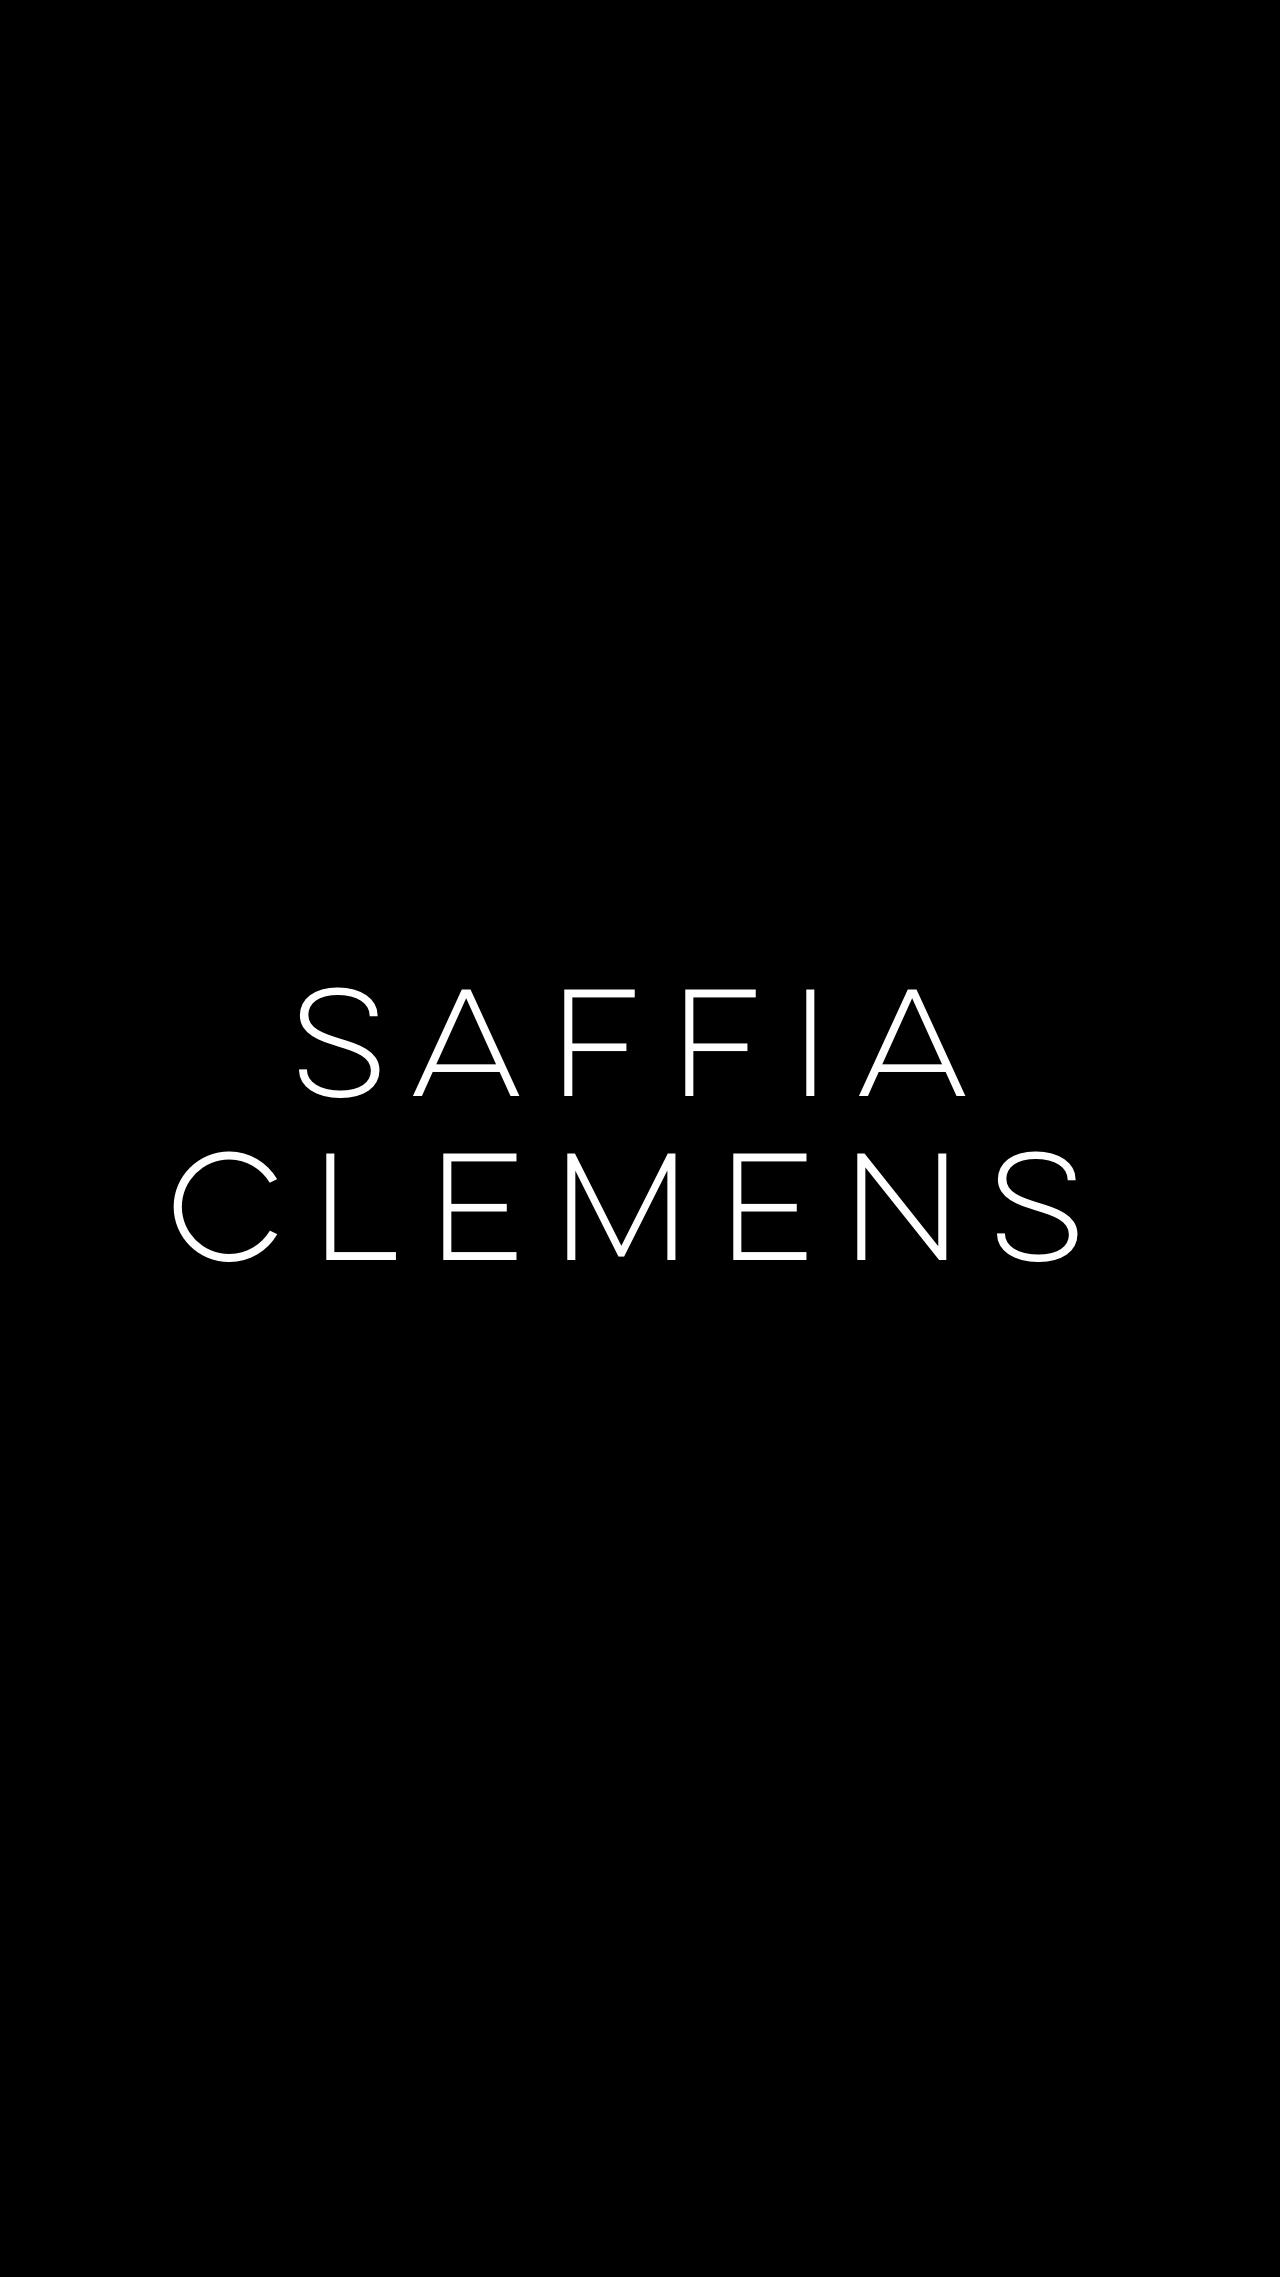 SAFFIA CLEMENS.jpg